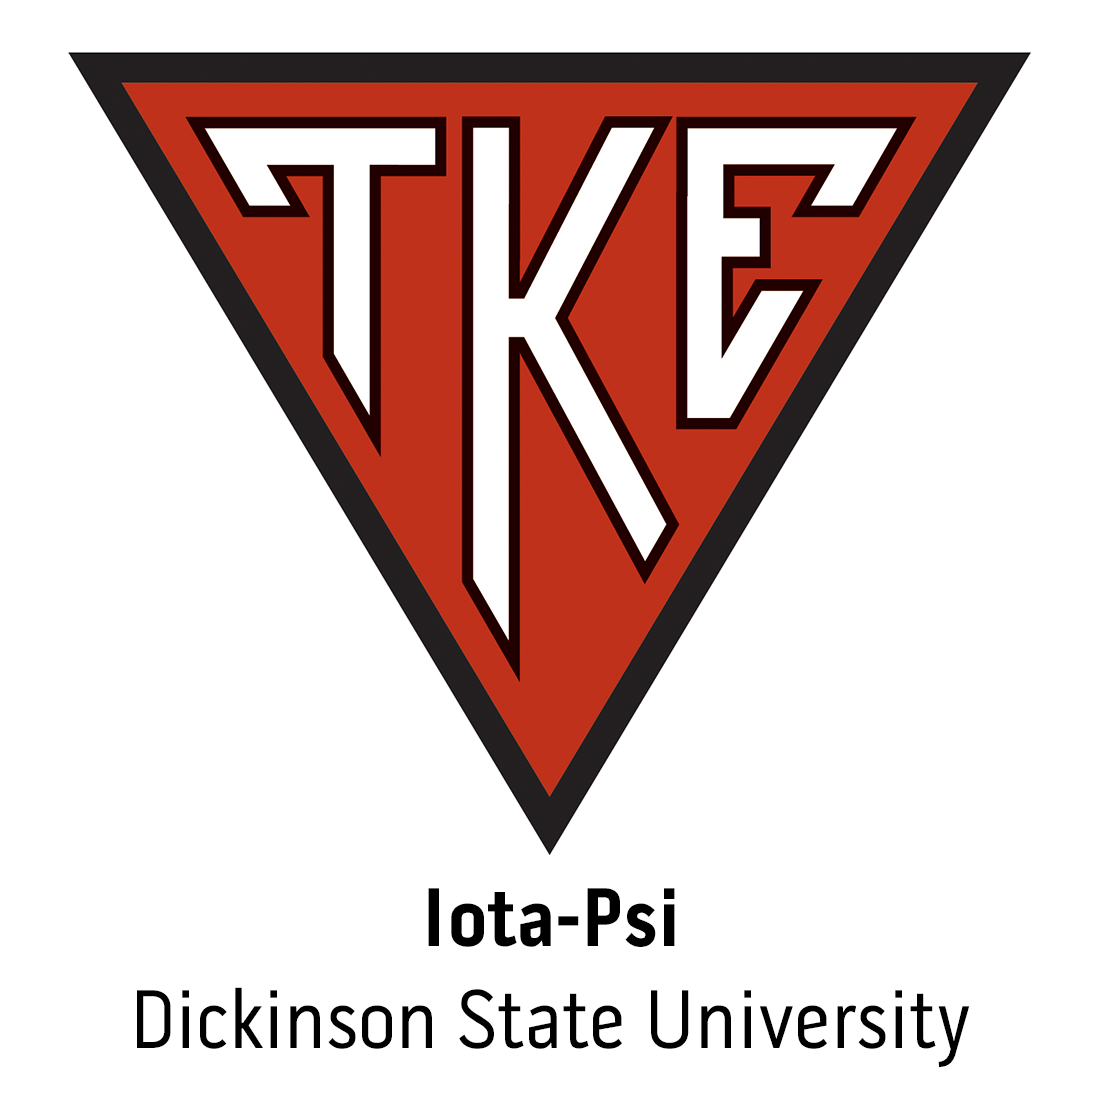 Iota-Psi Colony at Dickinson State University